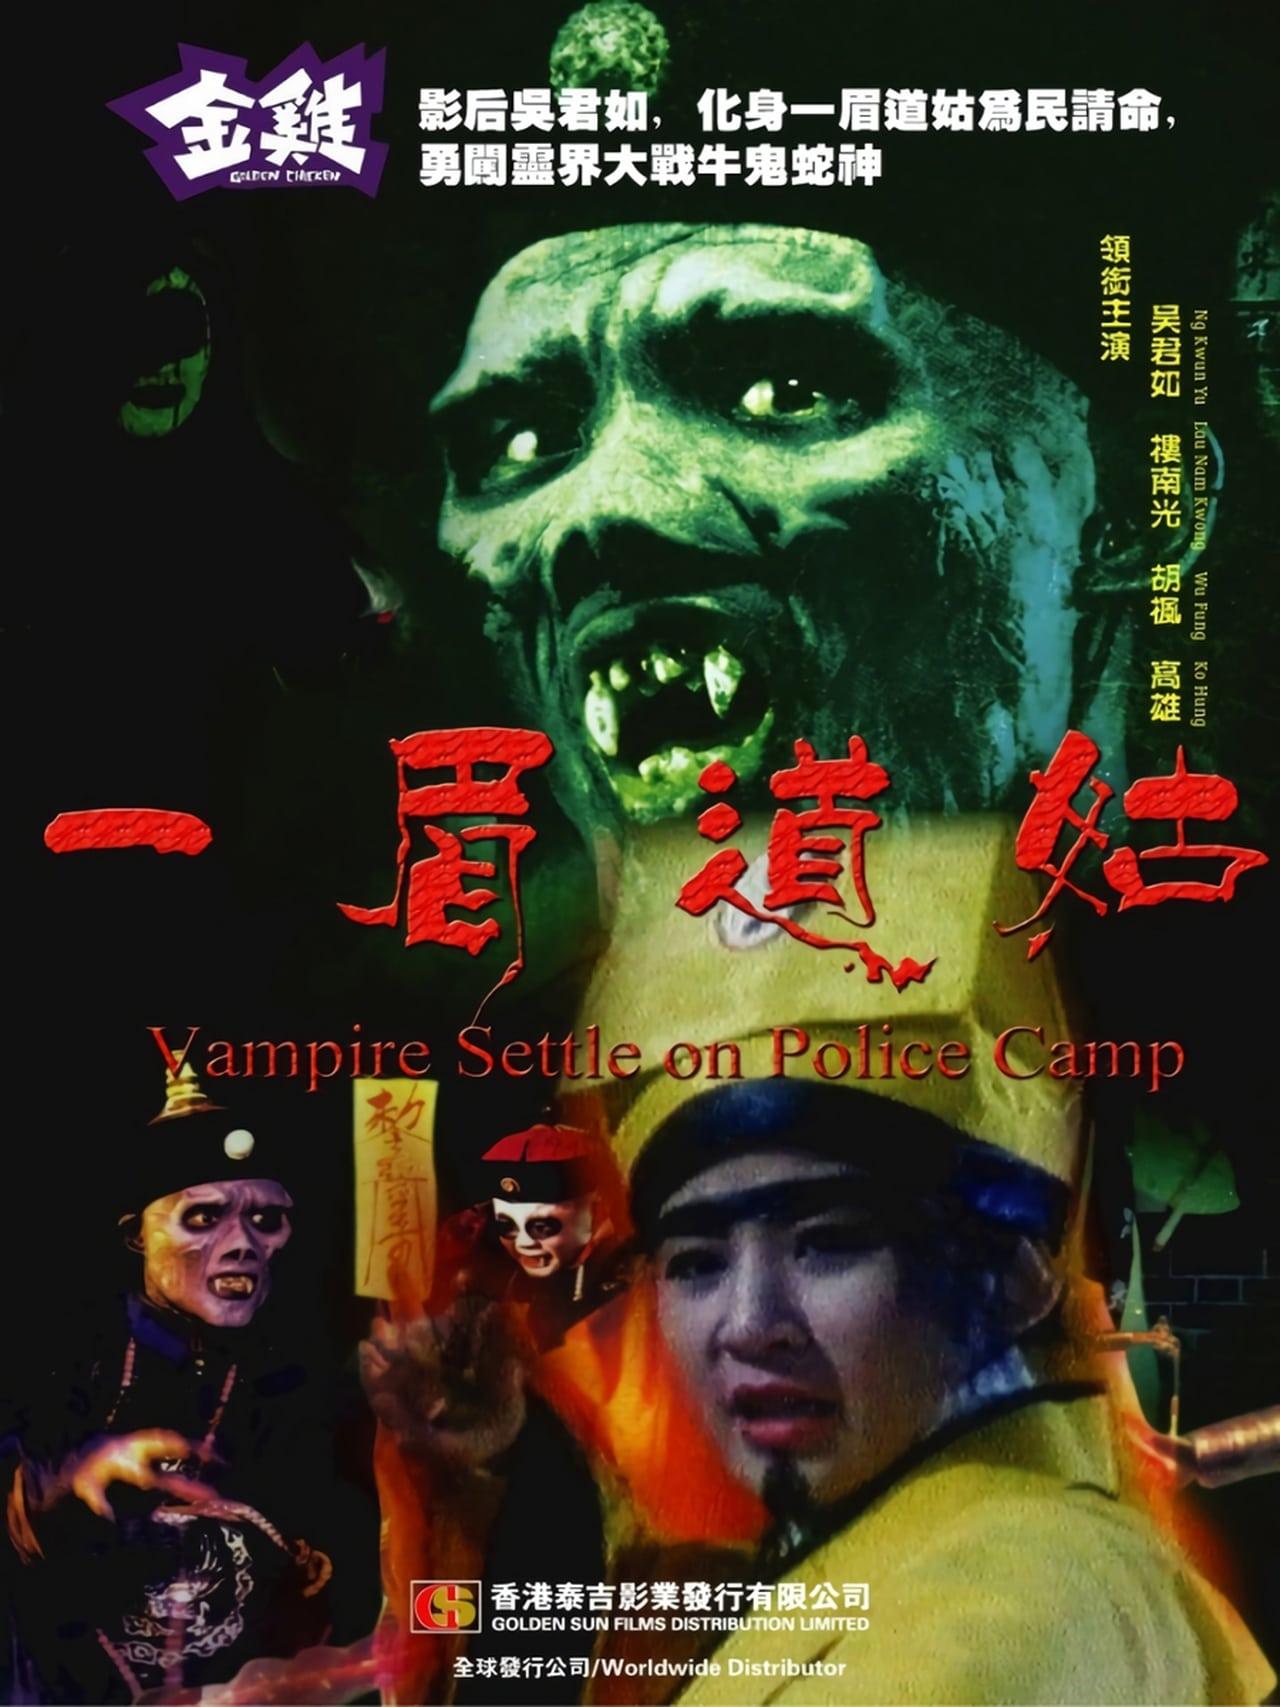 Vampire Settle On Police Camp